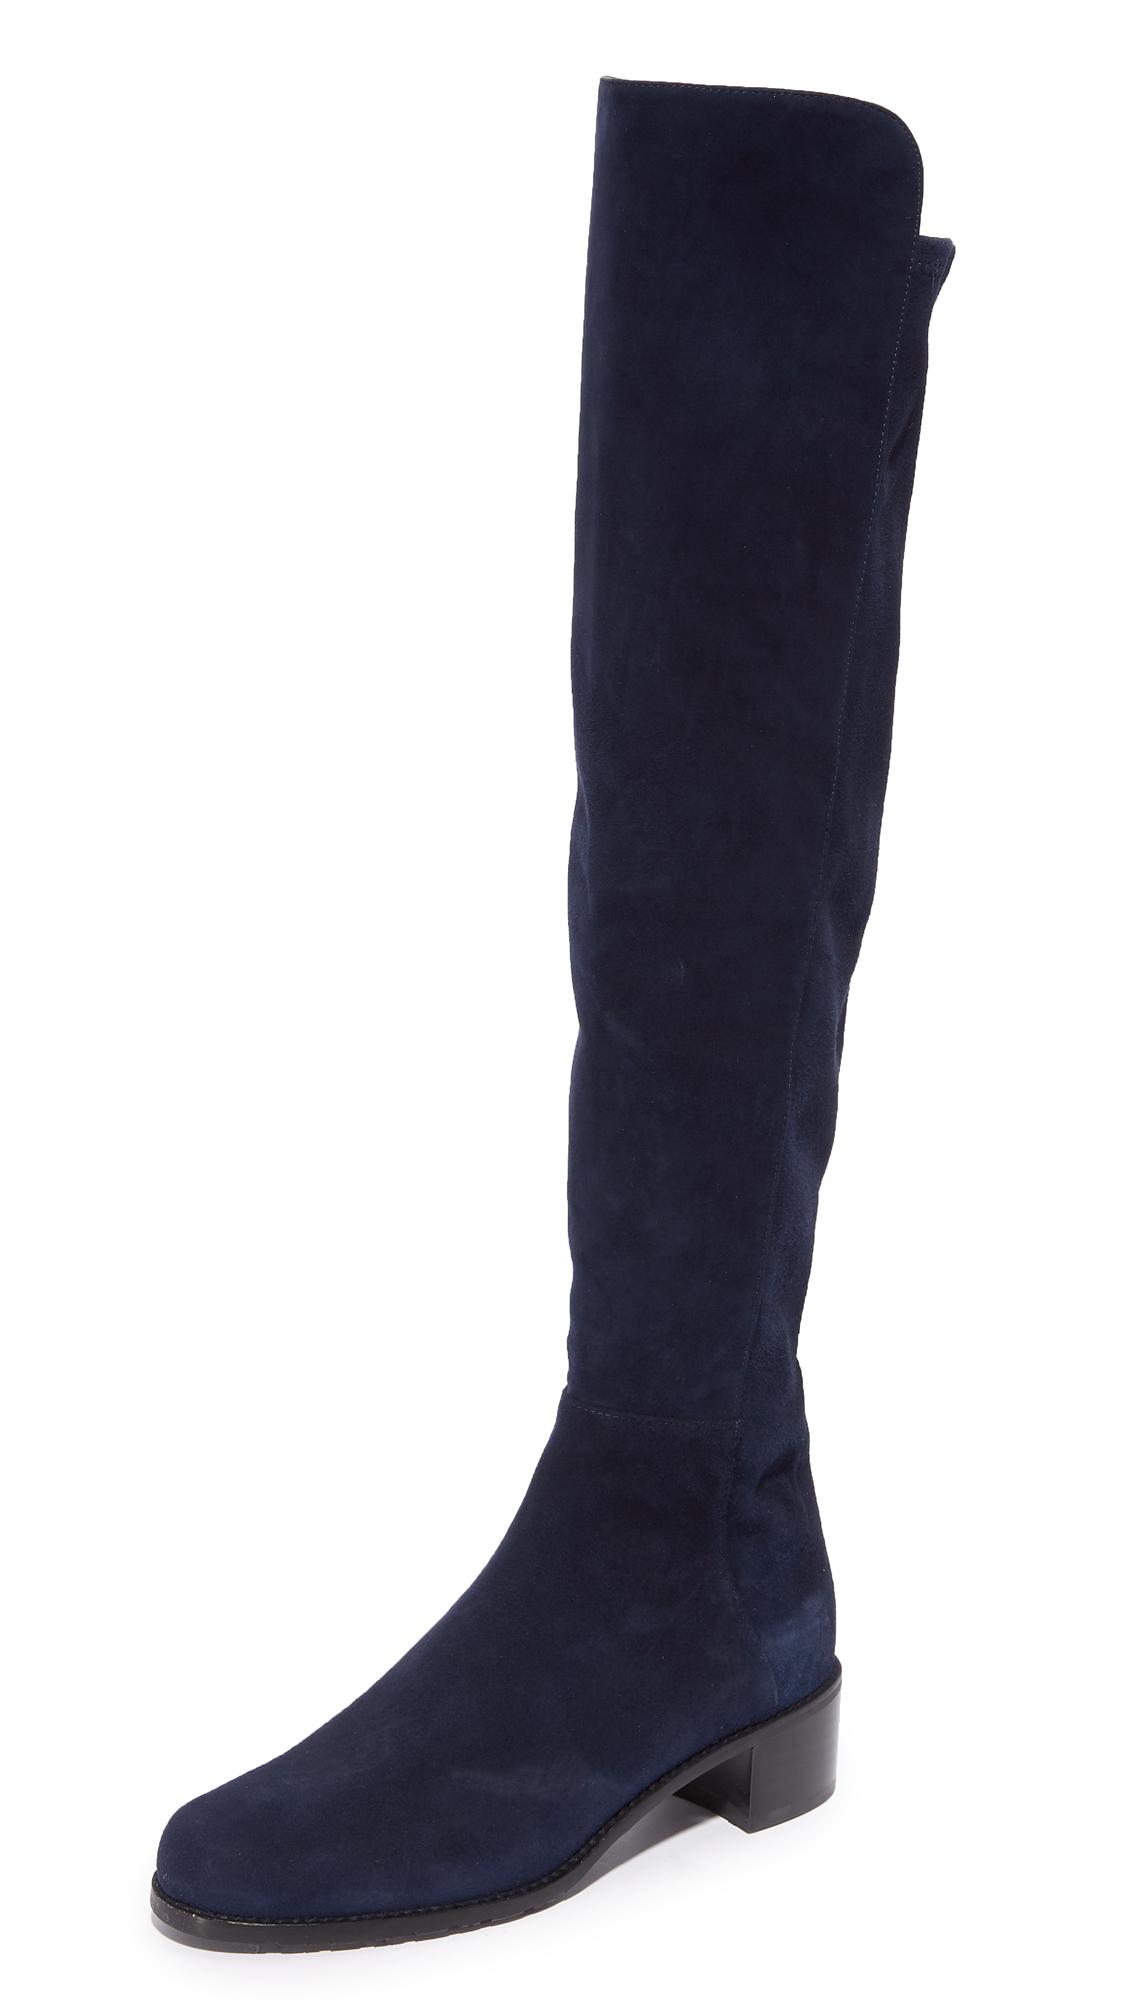 Stuart Weitzman All Serve Knee High Boots - Nice Blue